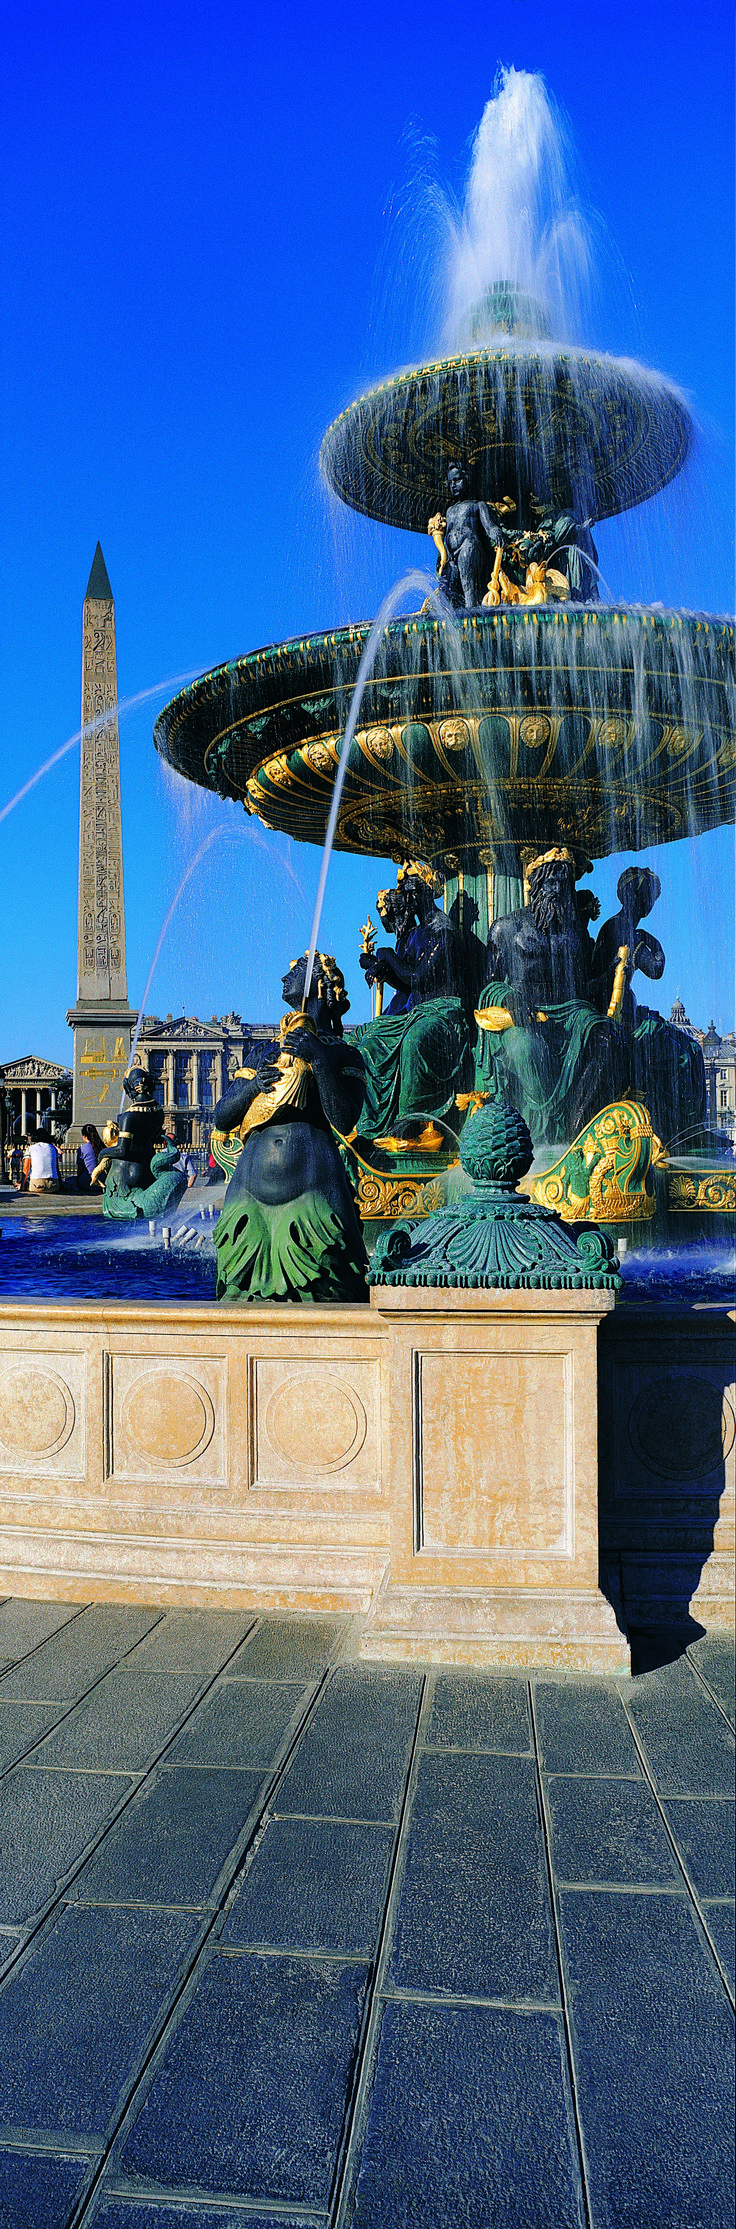 Place de la Concorde Fountain, Paris